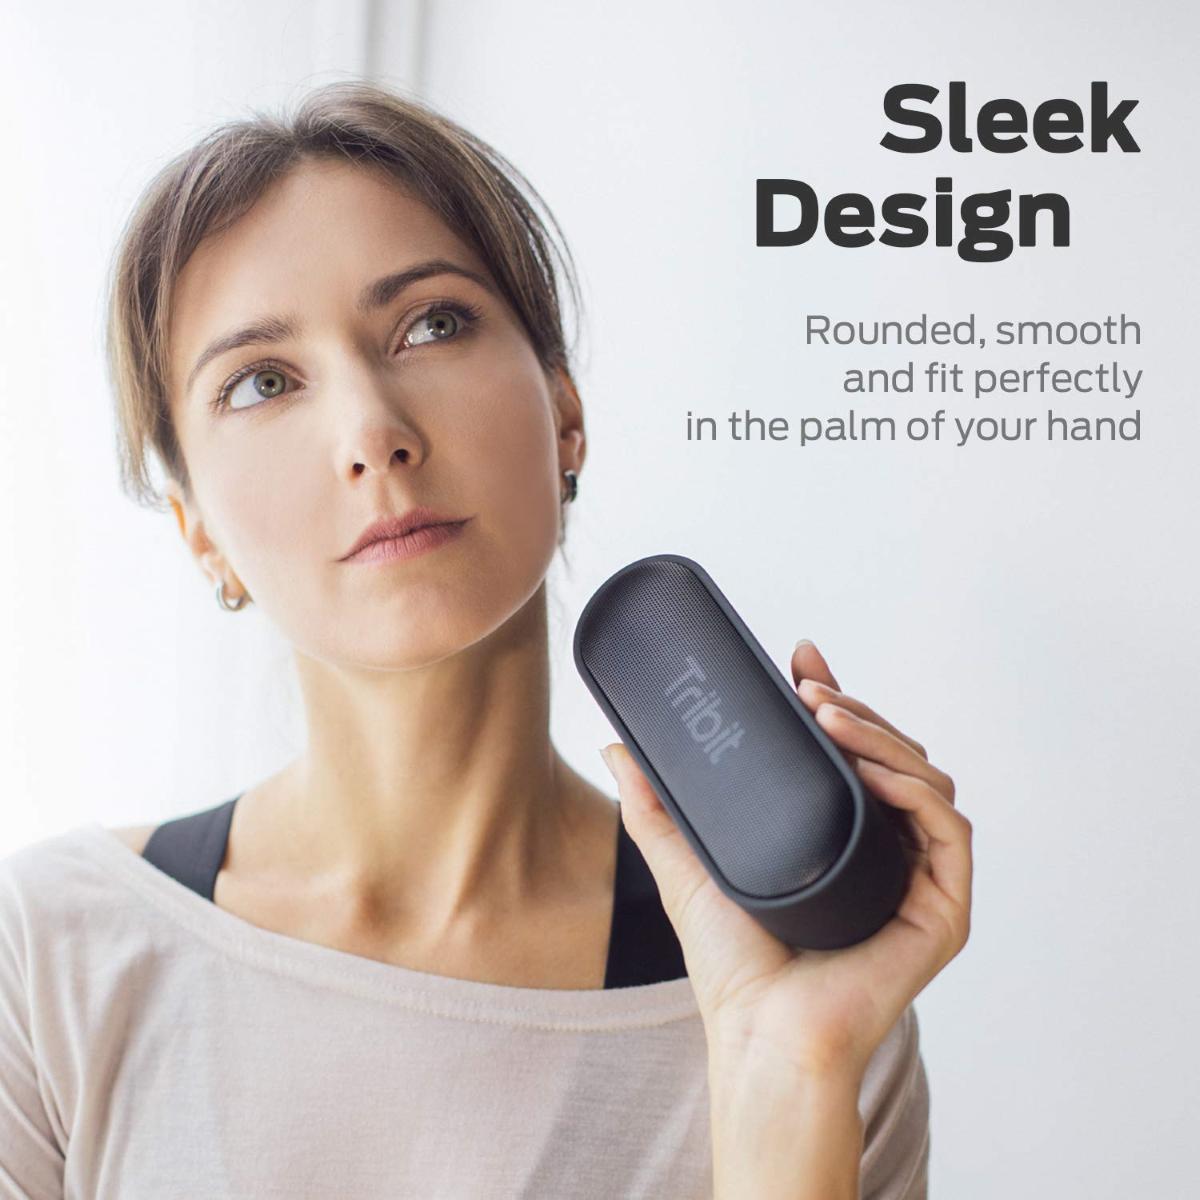 XSound Go - Design